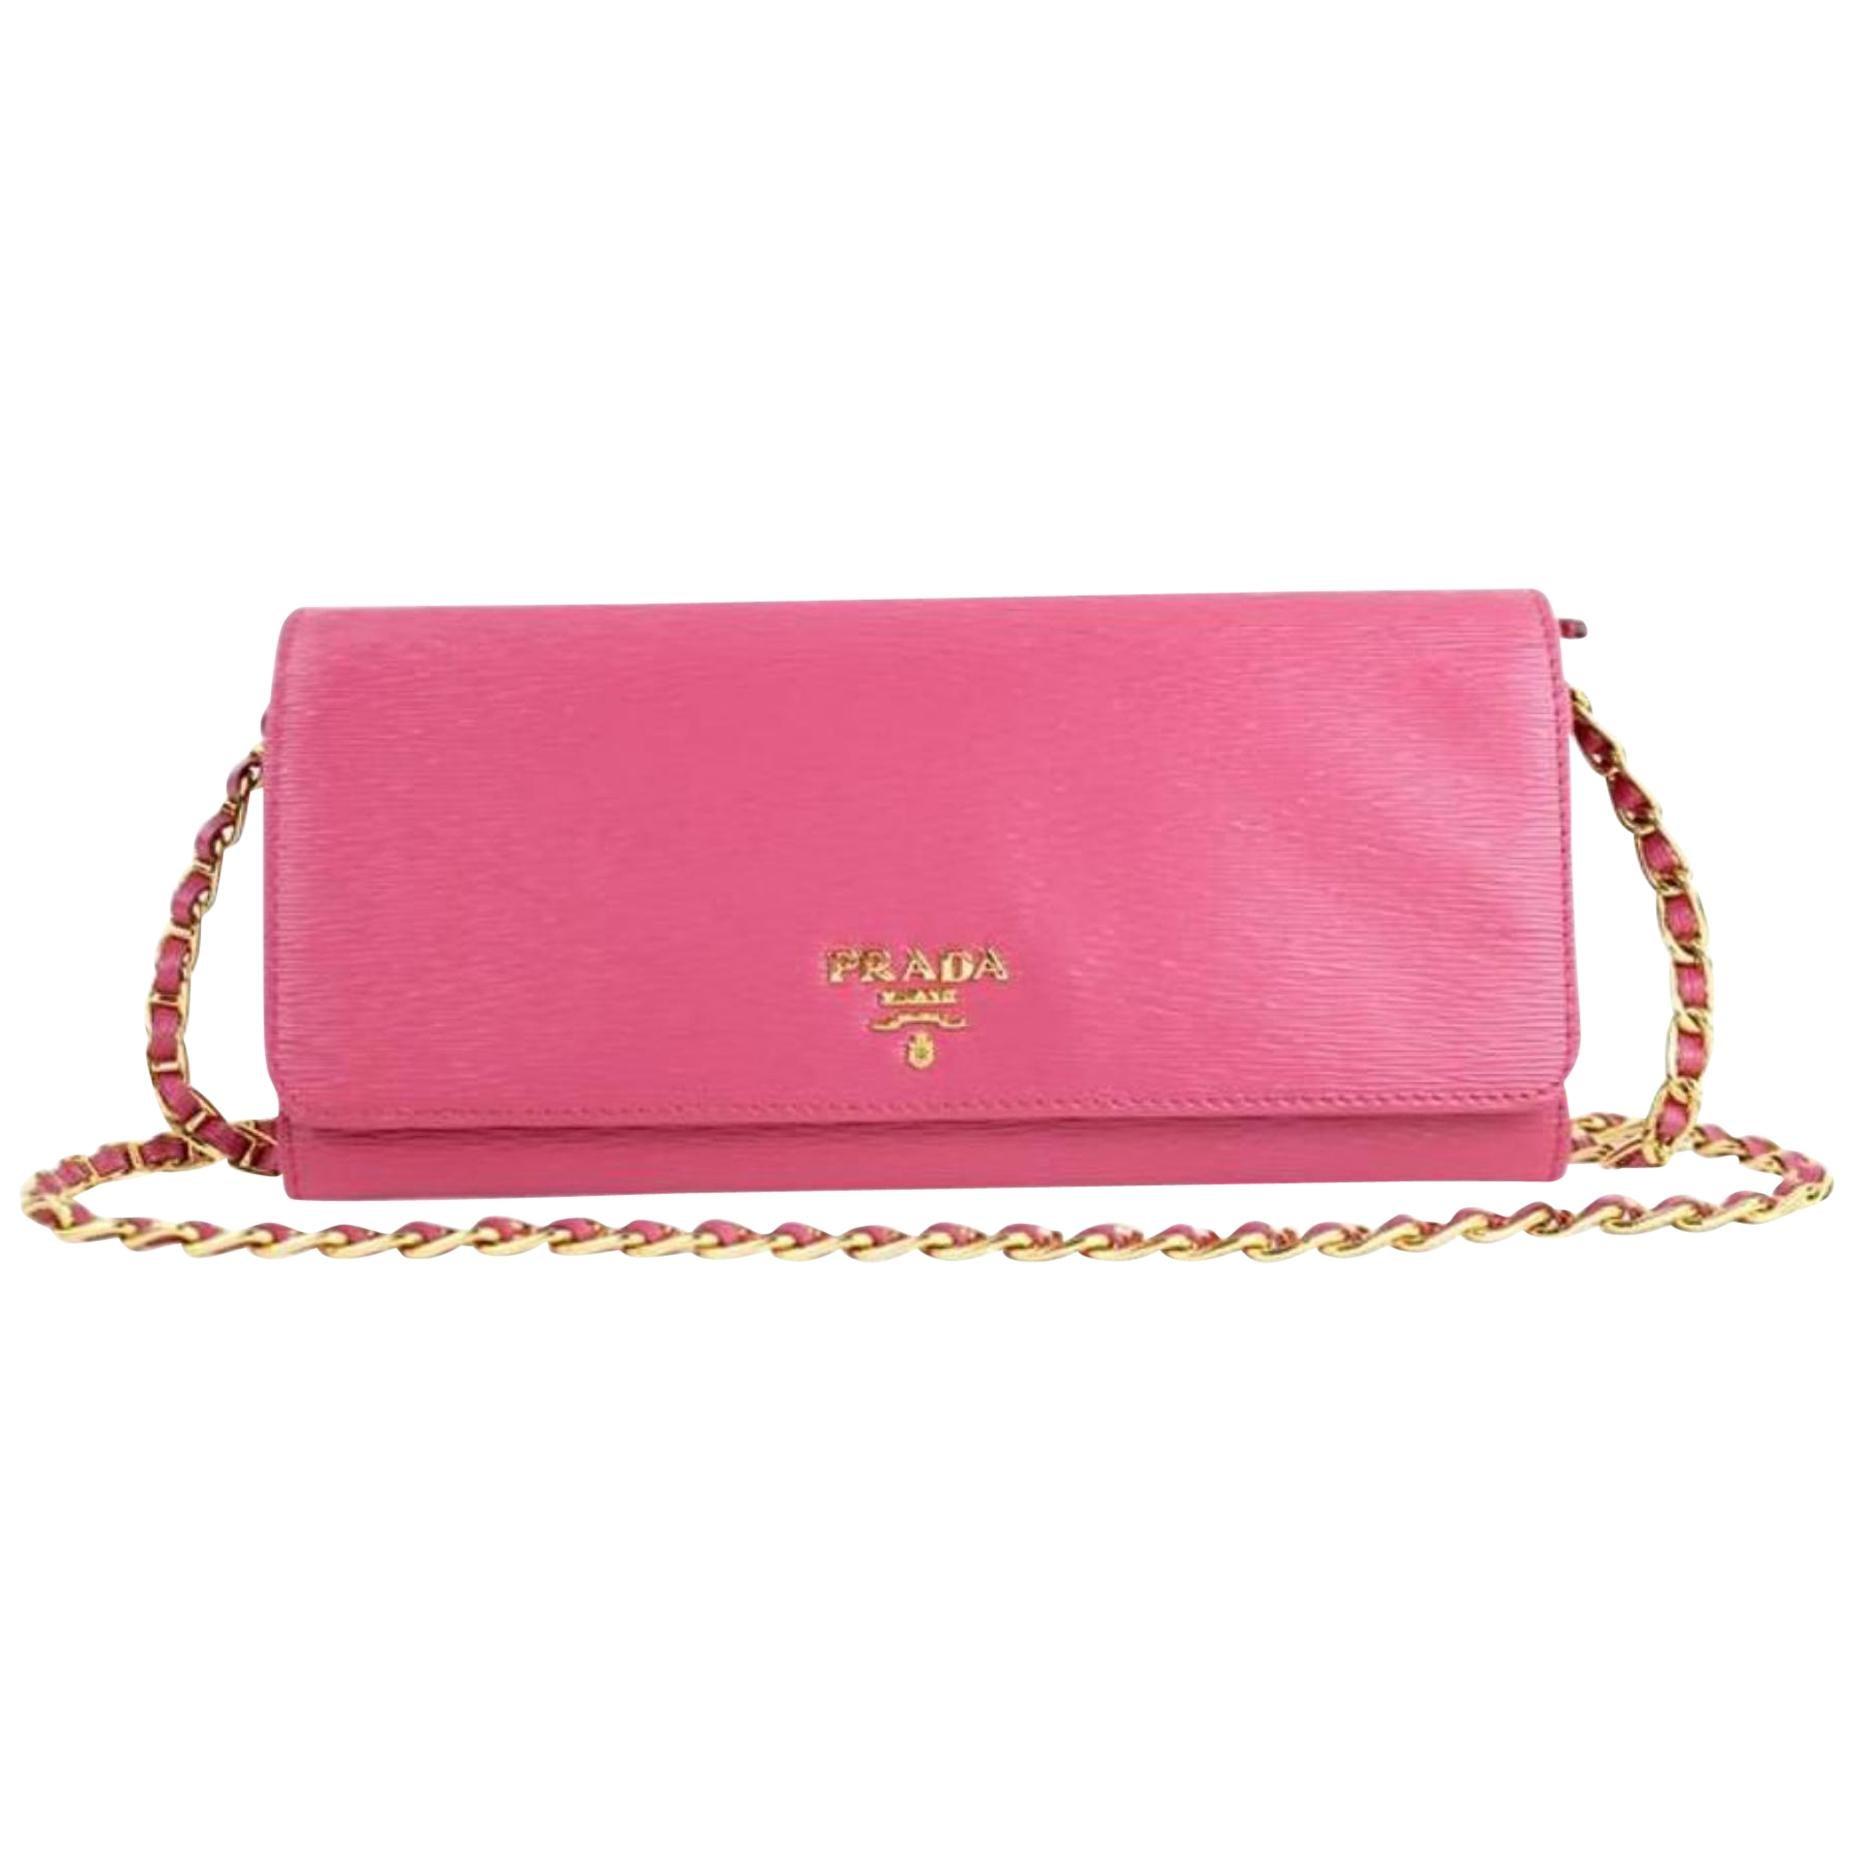 ef93d4d66ce Vintage Prada Handbags and Purses - 1,006 For Sale at 1stdibs